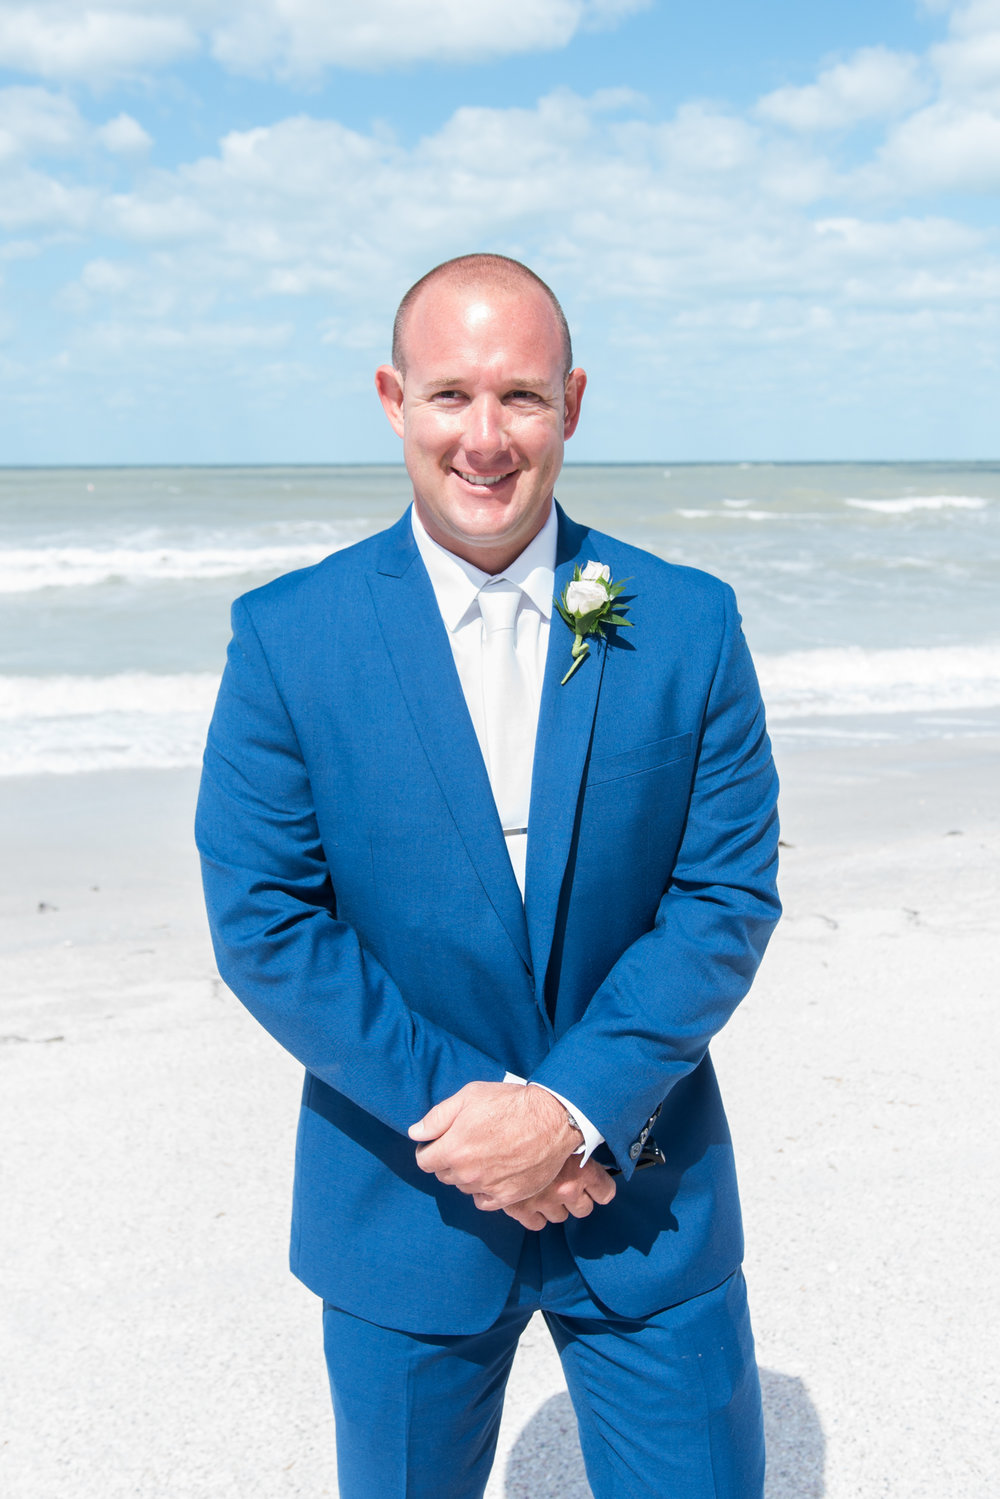 st-pete-beach-wedding-groom, tampa-wedding-photographer